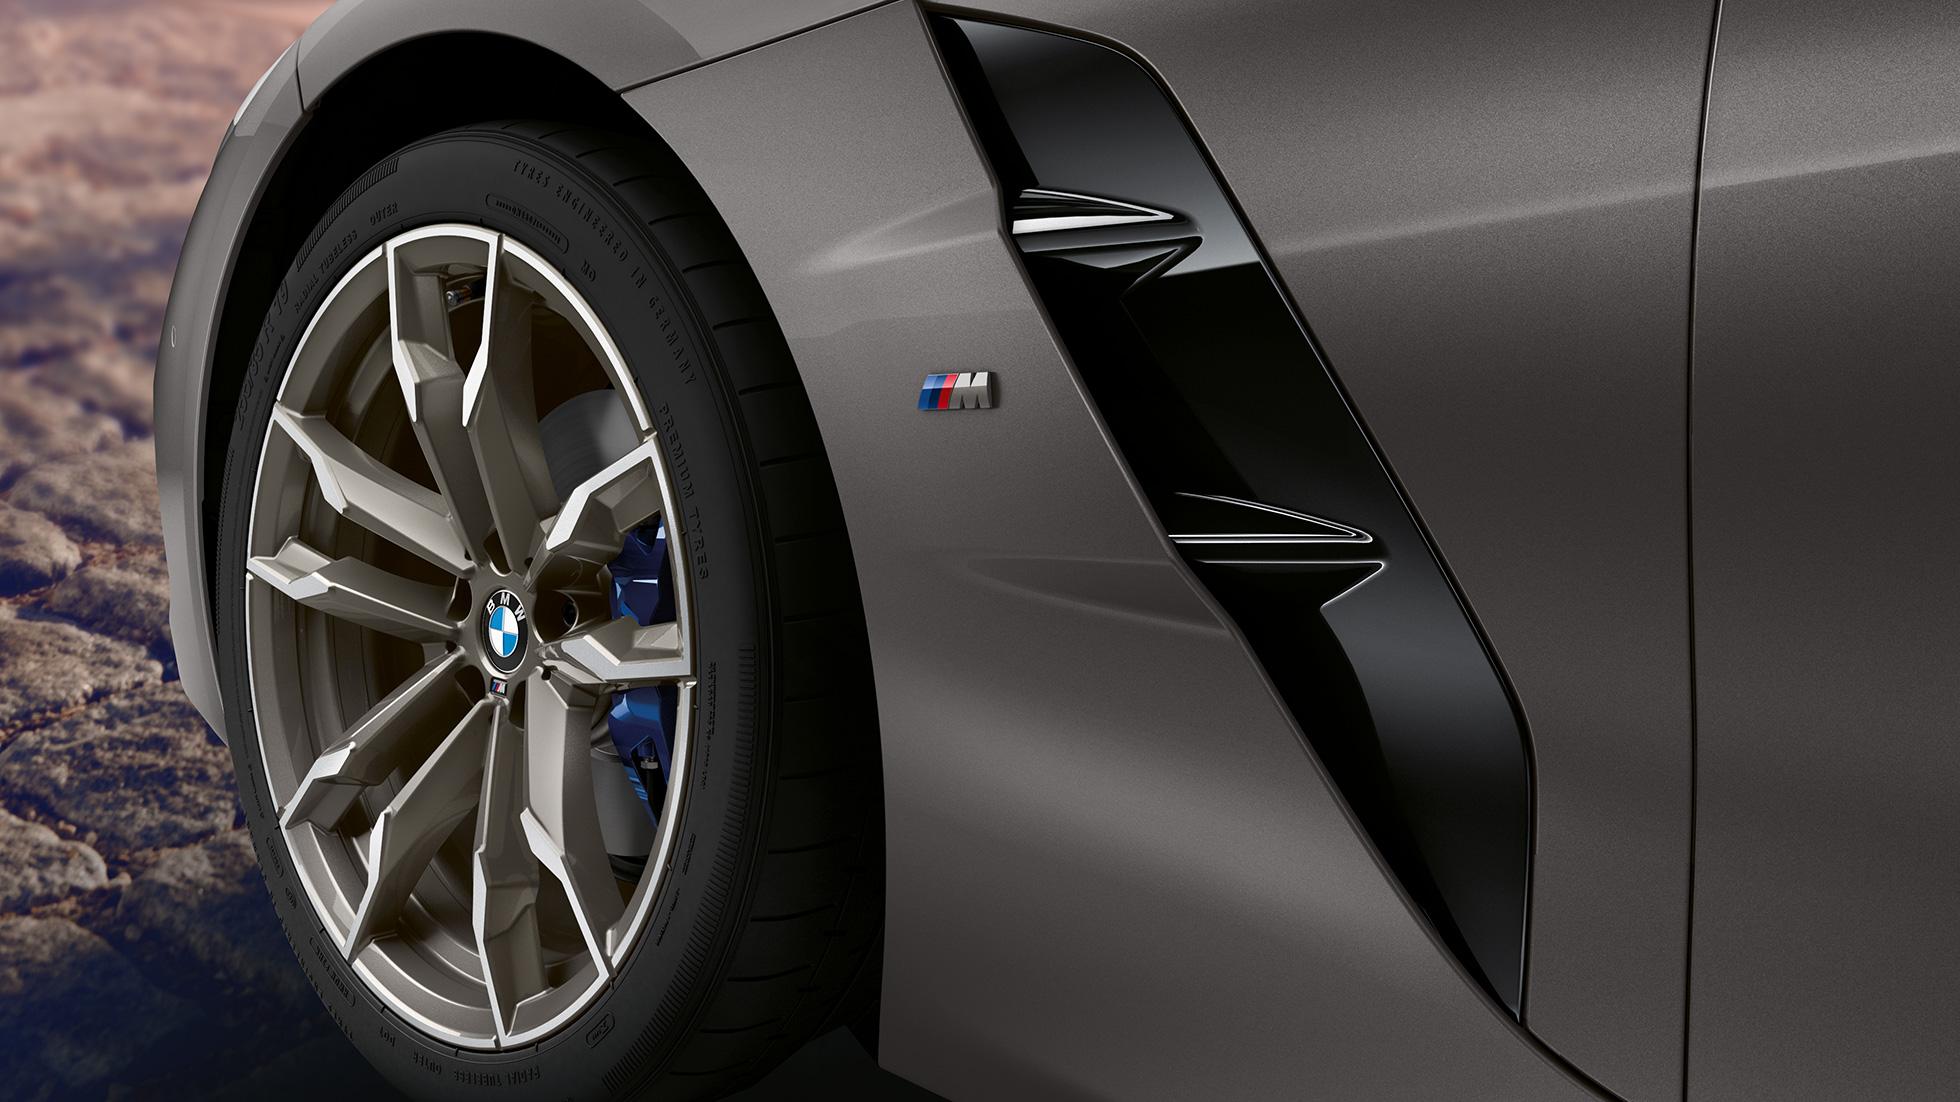 BMW Z4 Roadster в сером цвете, переднее колесо